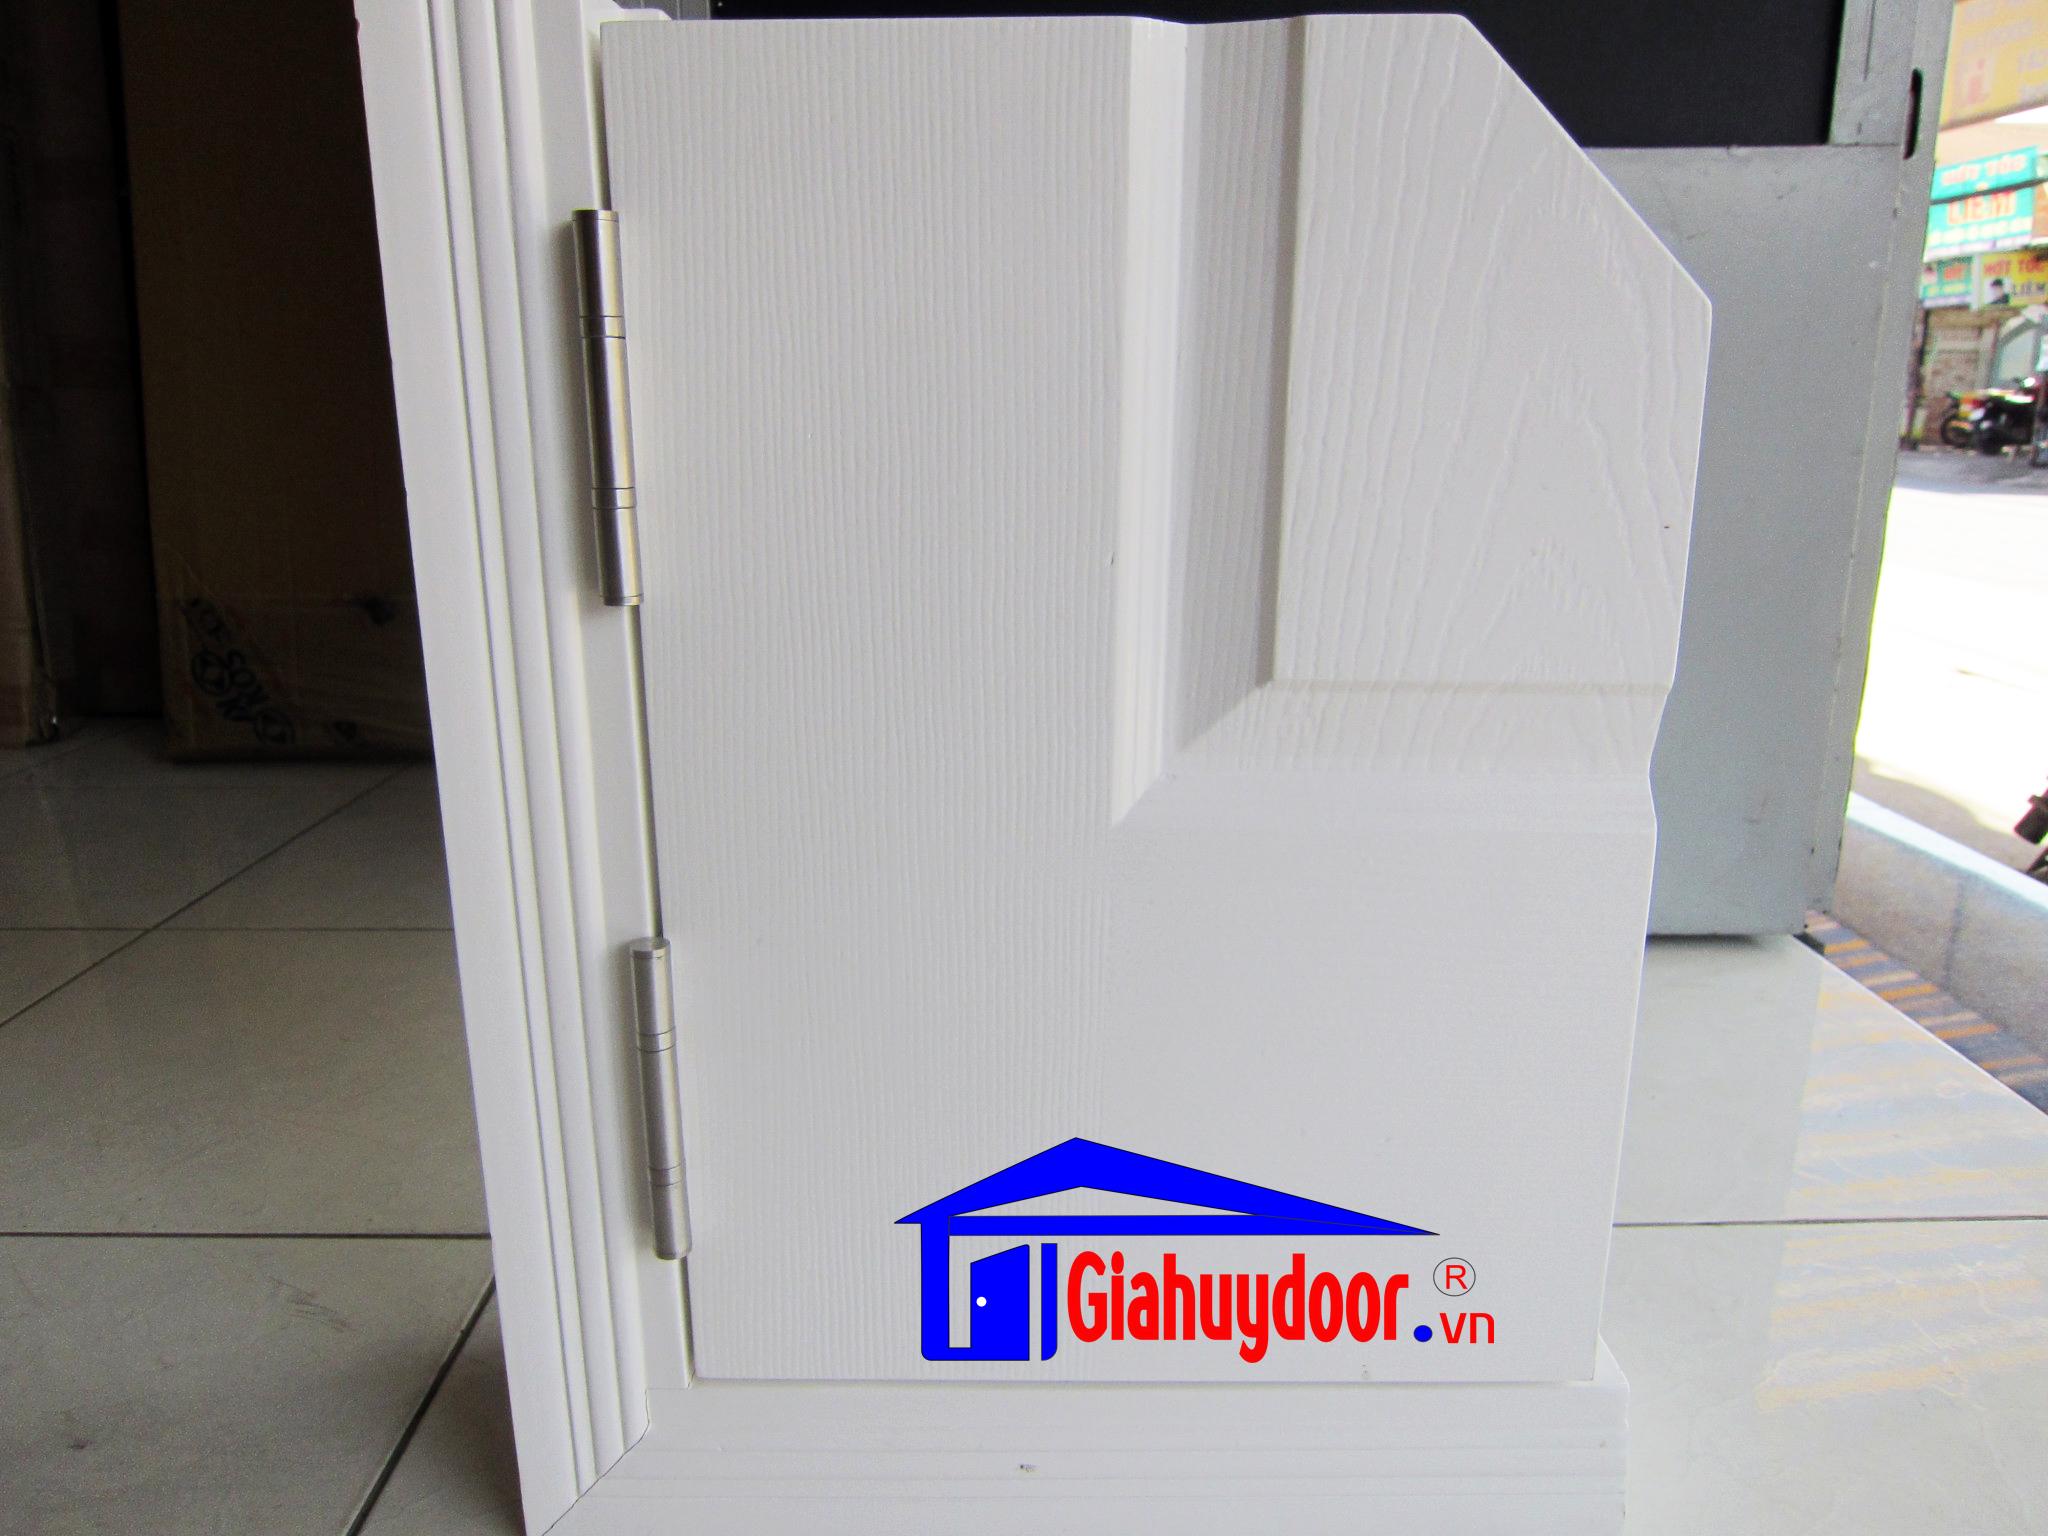 Cửa gỗ công nghiệp HDF GHD 6B-C6 - GIAHUYDOOR 0886.500.500